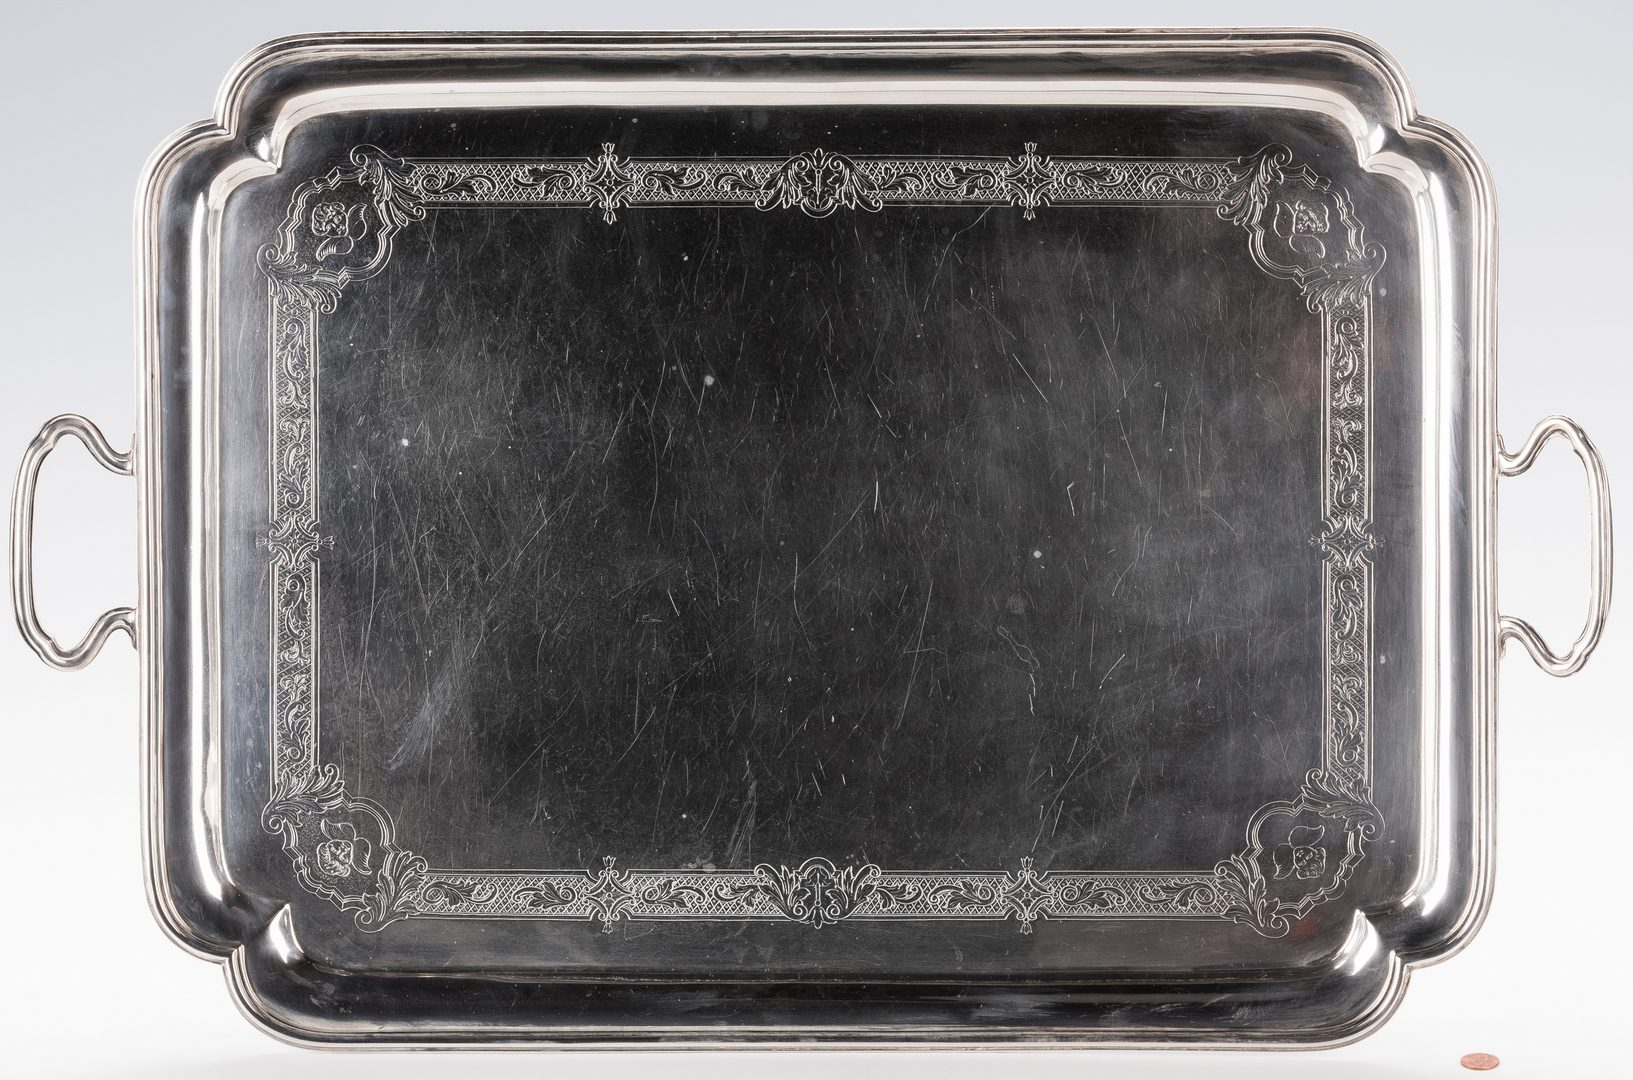 Lot 85: George VI Sterling Silver Tray, Crichton Bros.